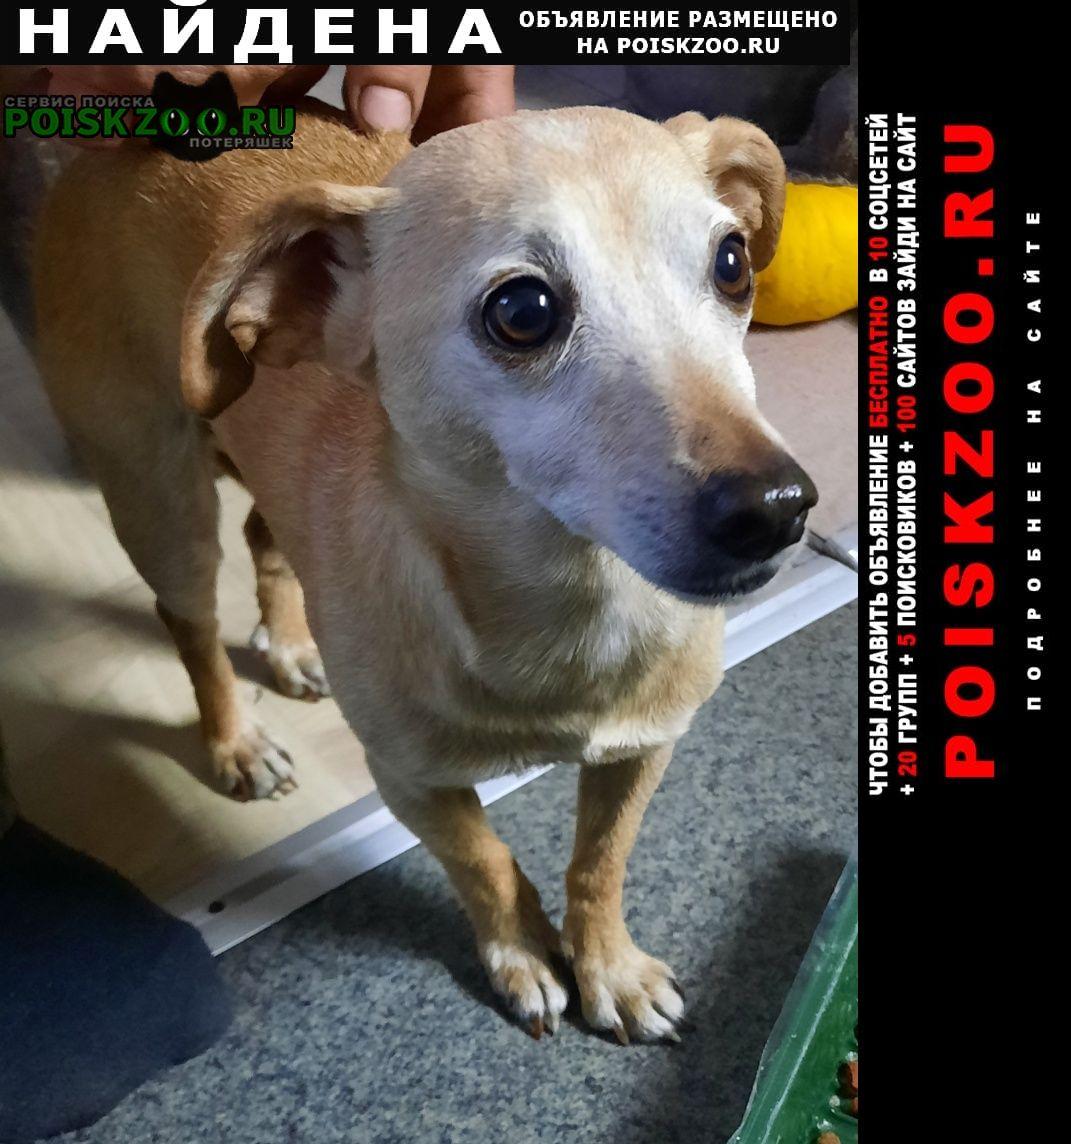 Найдена собака Новокузнецк